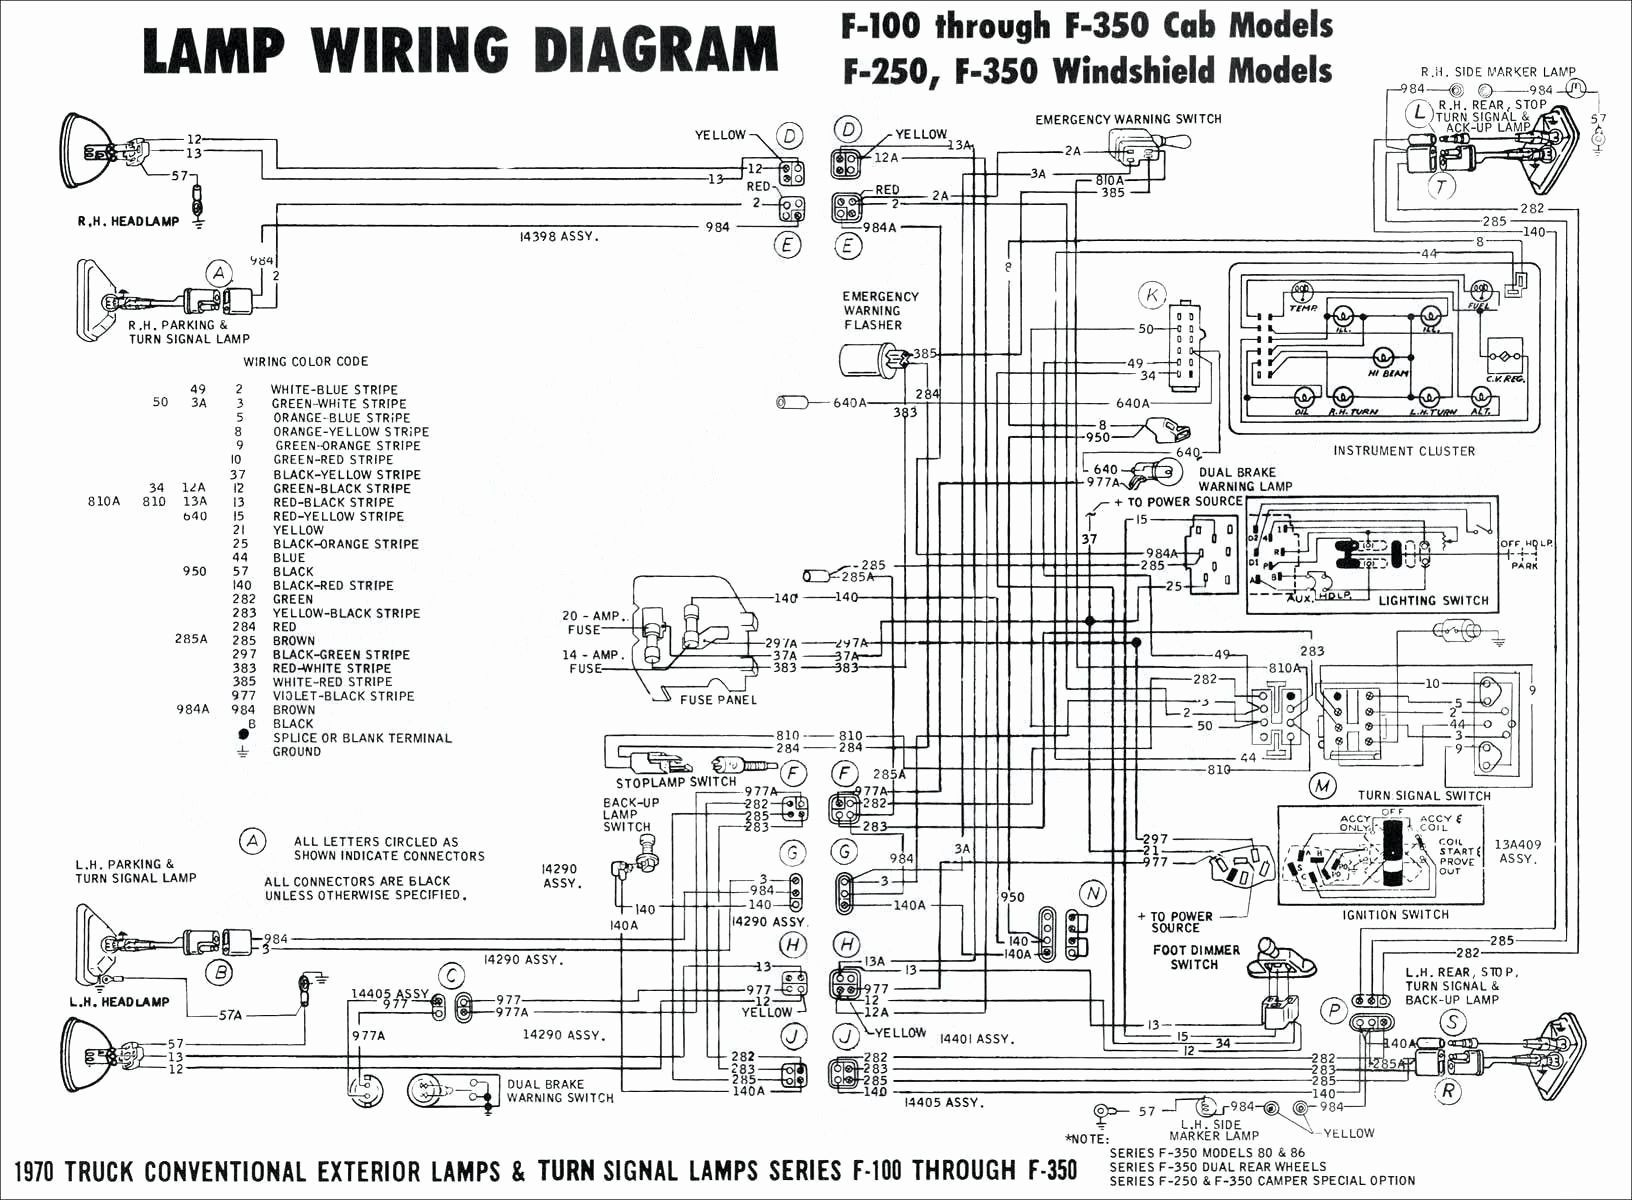 gage rampampr spreadsheet for john deere 4020 wiring diagram fuel gauge then gage rampr spreadsheet